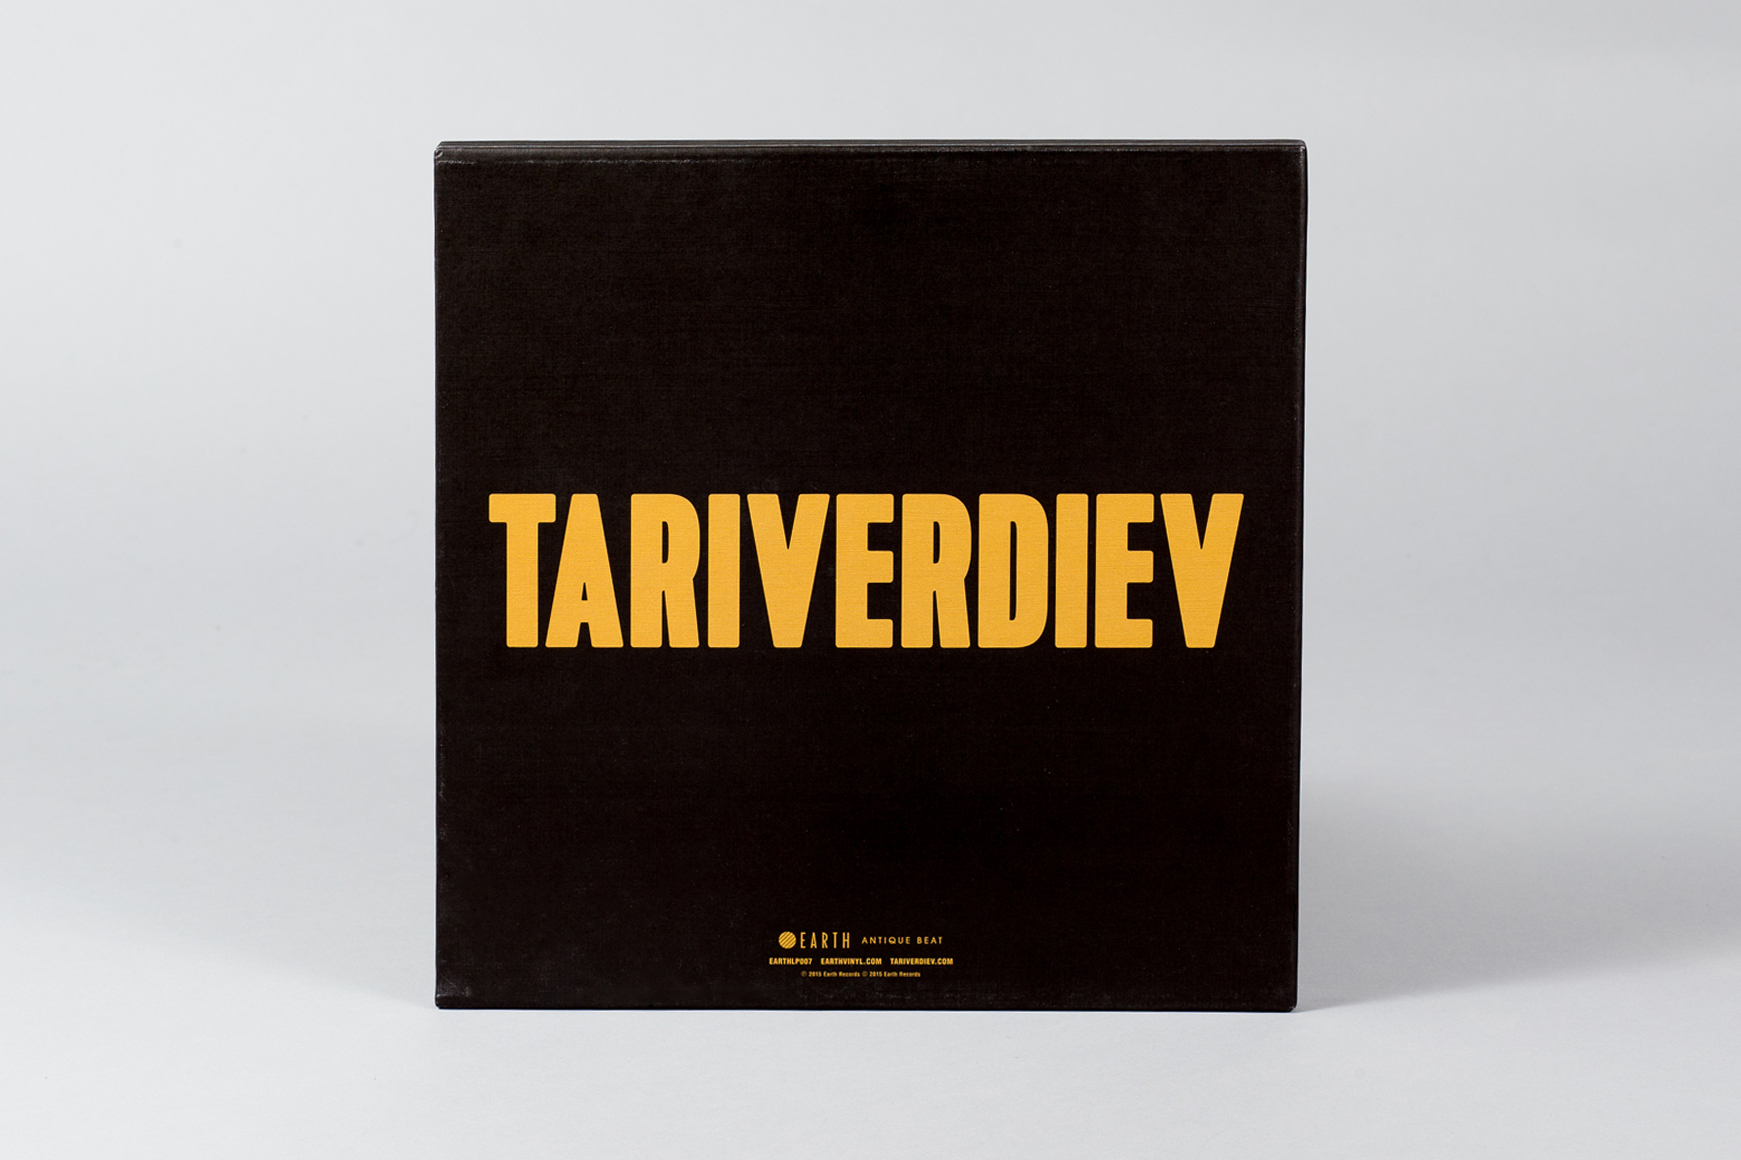 ©-The-Vinyl-Factory-Tariverdiev-Vinyl-Release-Photography-Michael-Wilkin_0012_1-5-of-30.jpg